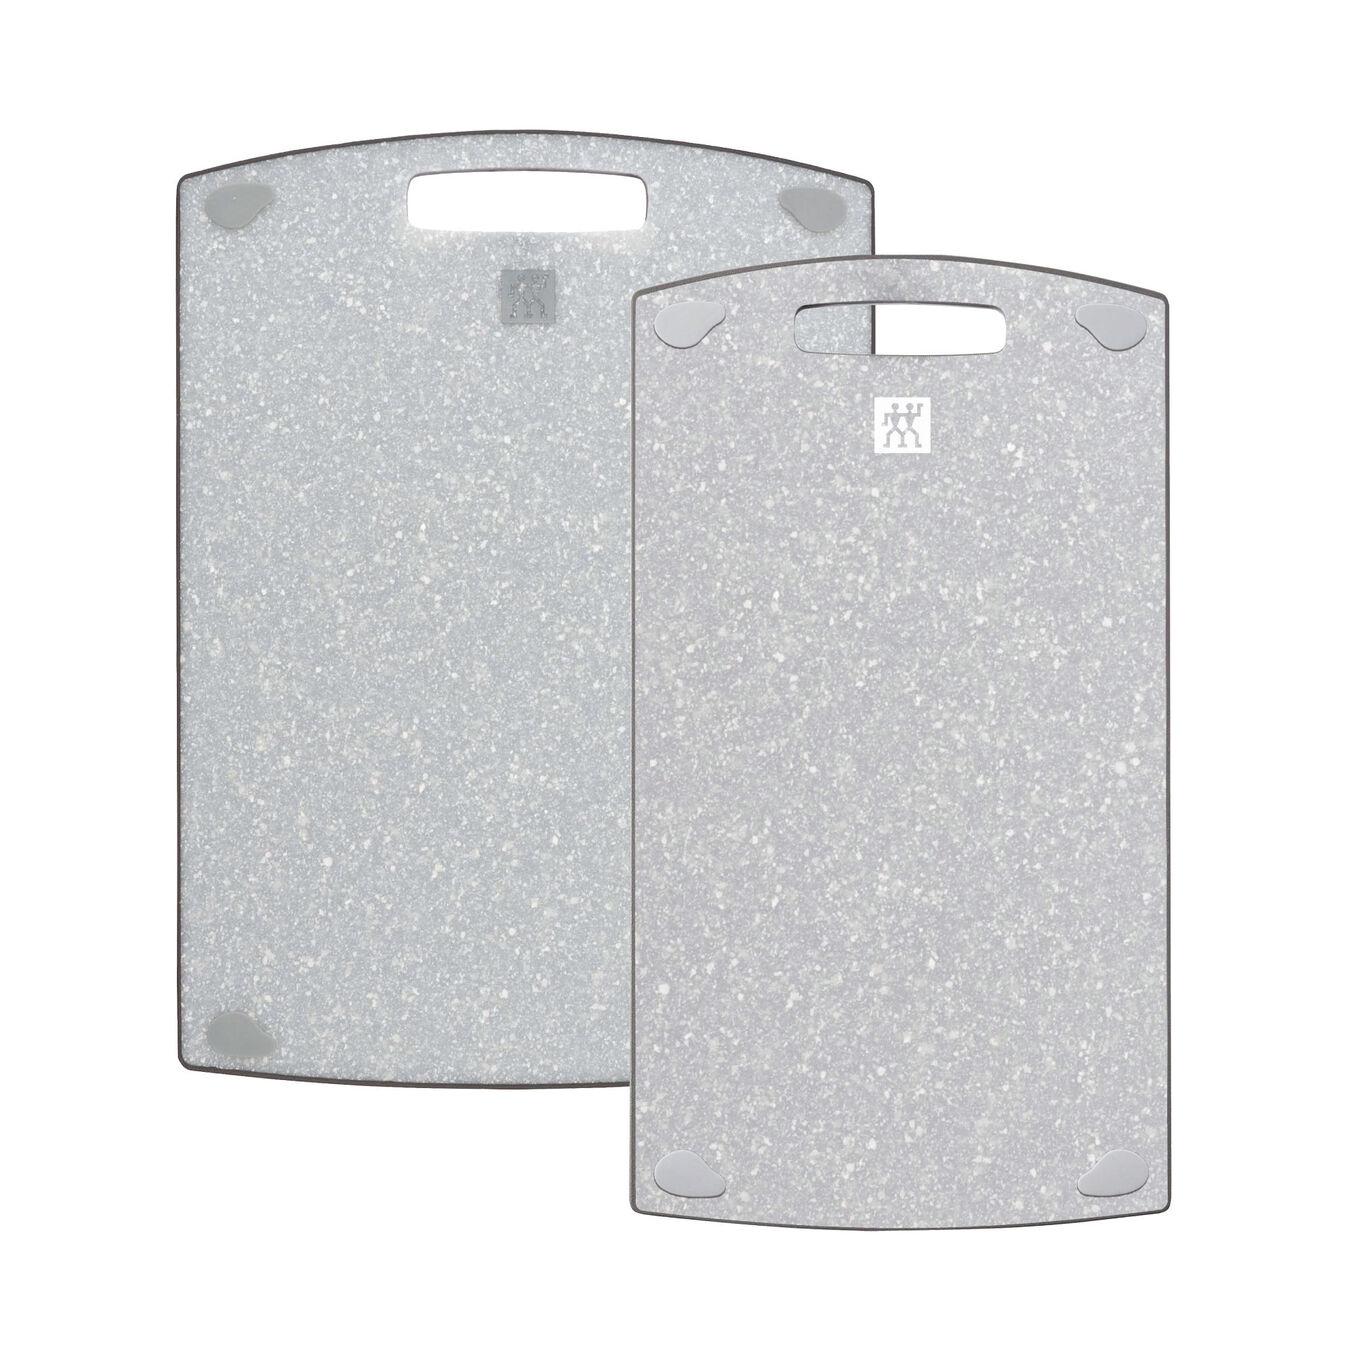 2 pc. Cutting board set, Plastic | 36 cm x 20 cm & 37 cm x 27 cm 36 cm x 20 cm Plastic,,large 3